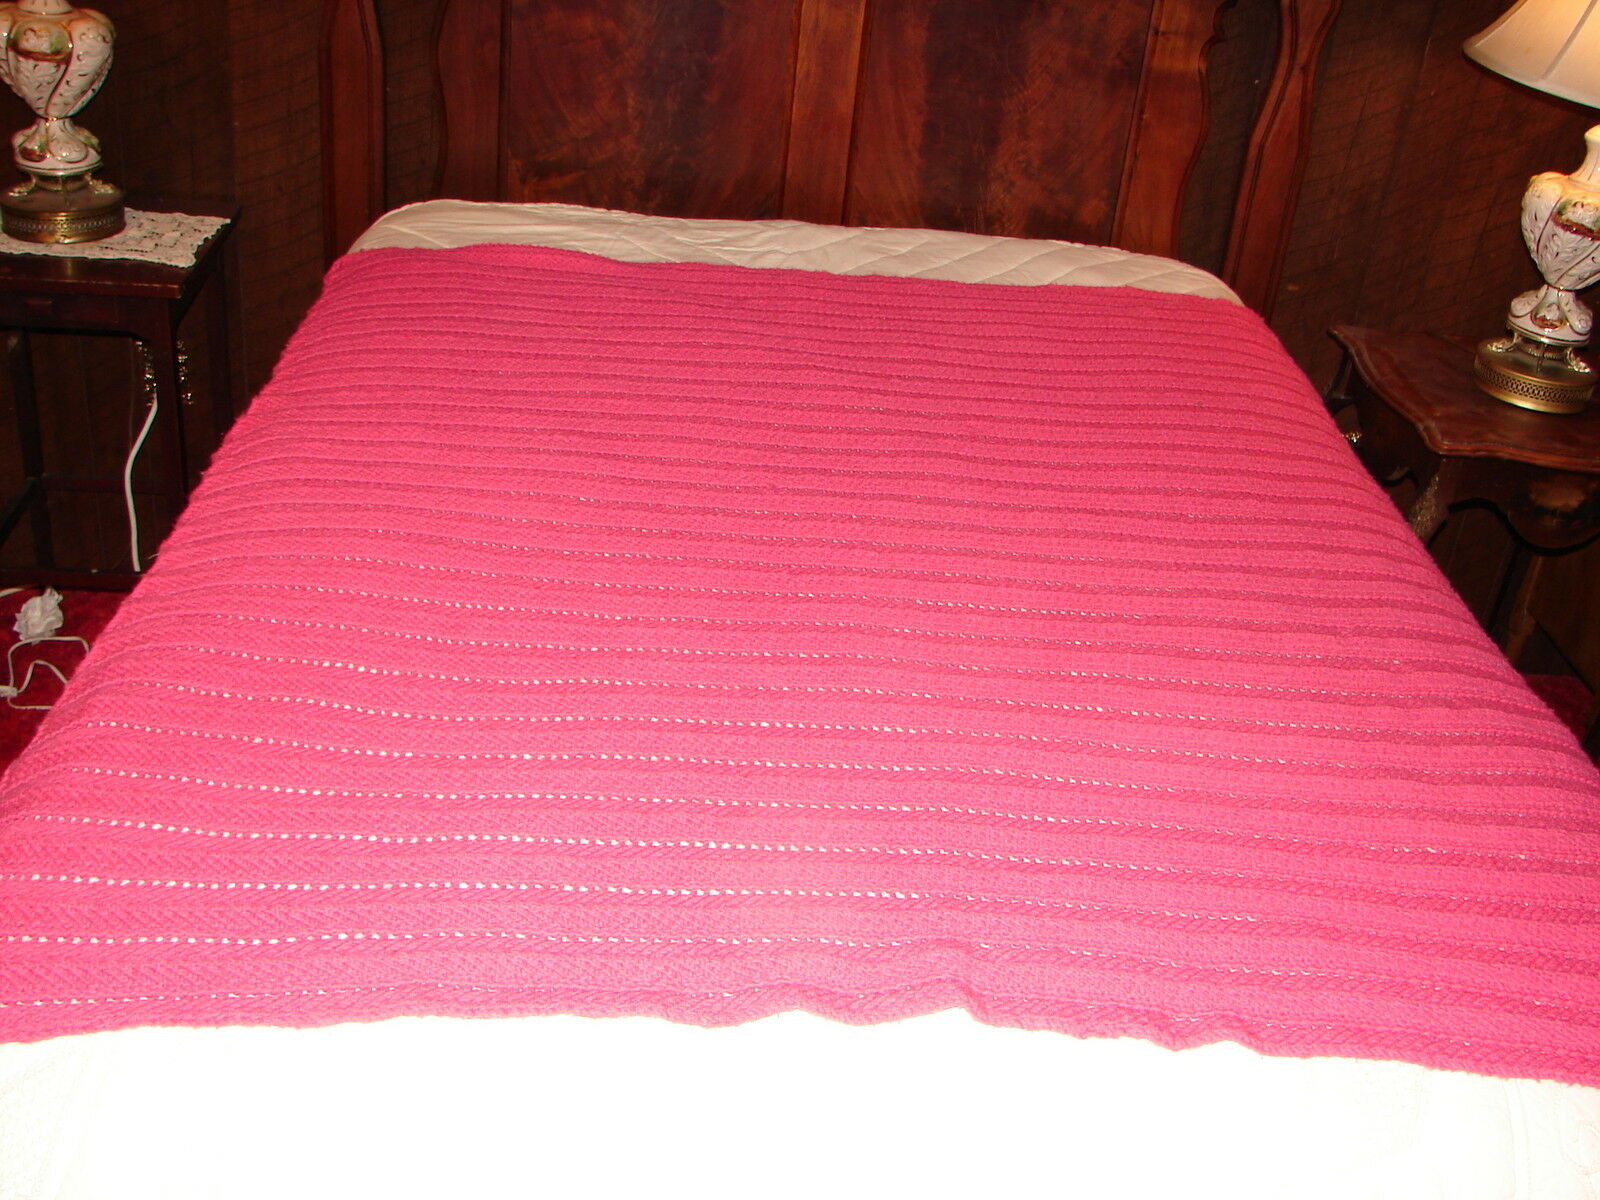 Handmade Handcrafted Crochet Afghan Throw Blanket  Afghan Complex pink color